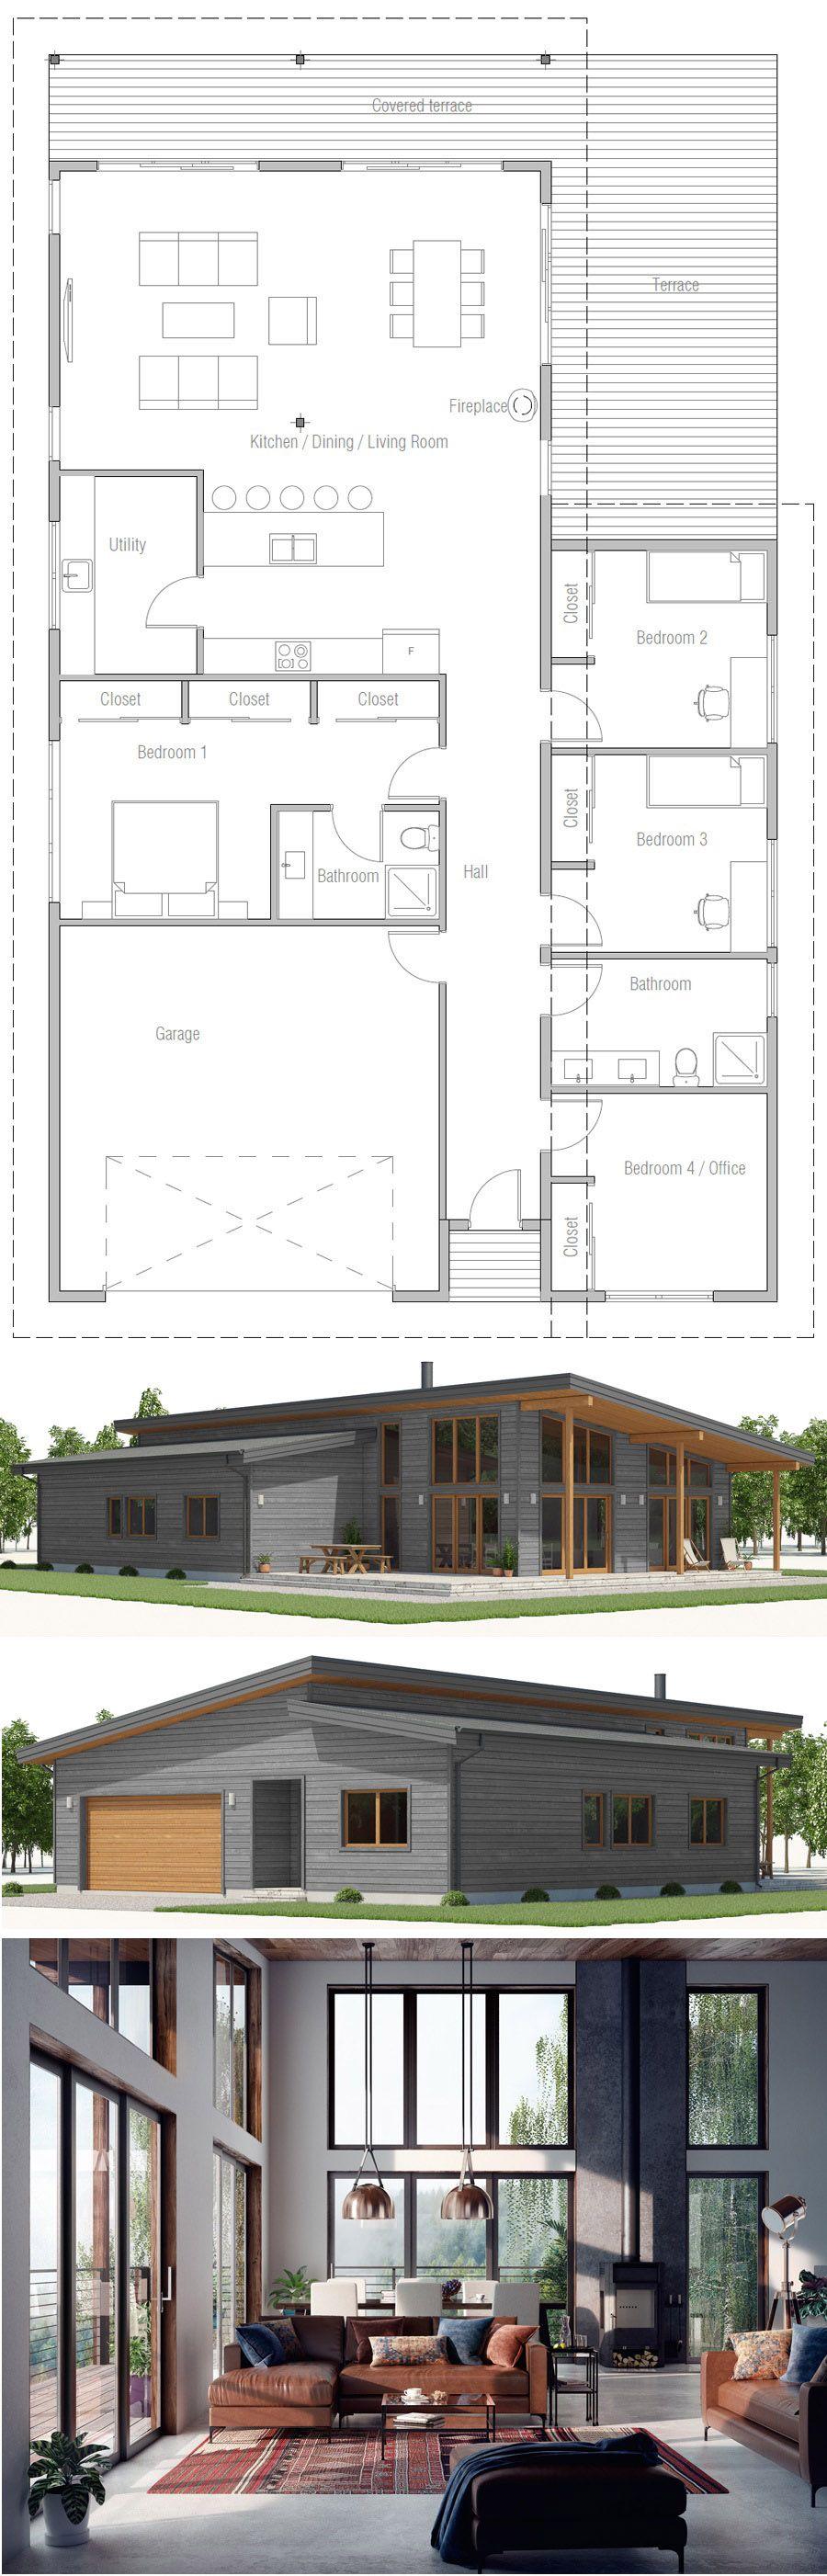 Floor plan architecture homedecor adhouseplans also simple rh pinterest